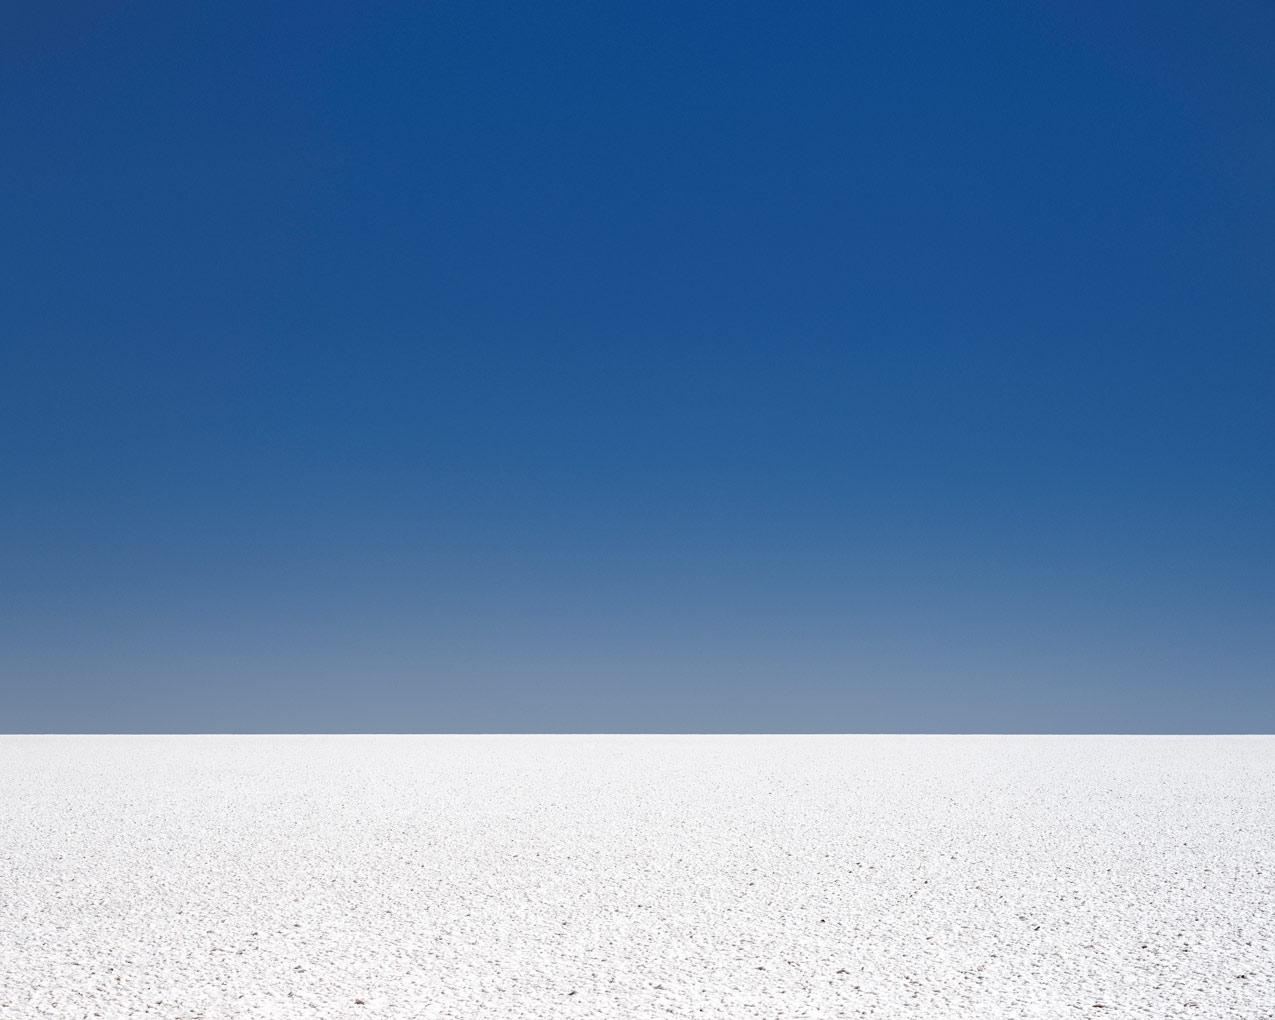 Salt 236, 120cm x 150cm, digital pigment print on cotton rag, edition of 7, 2008